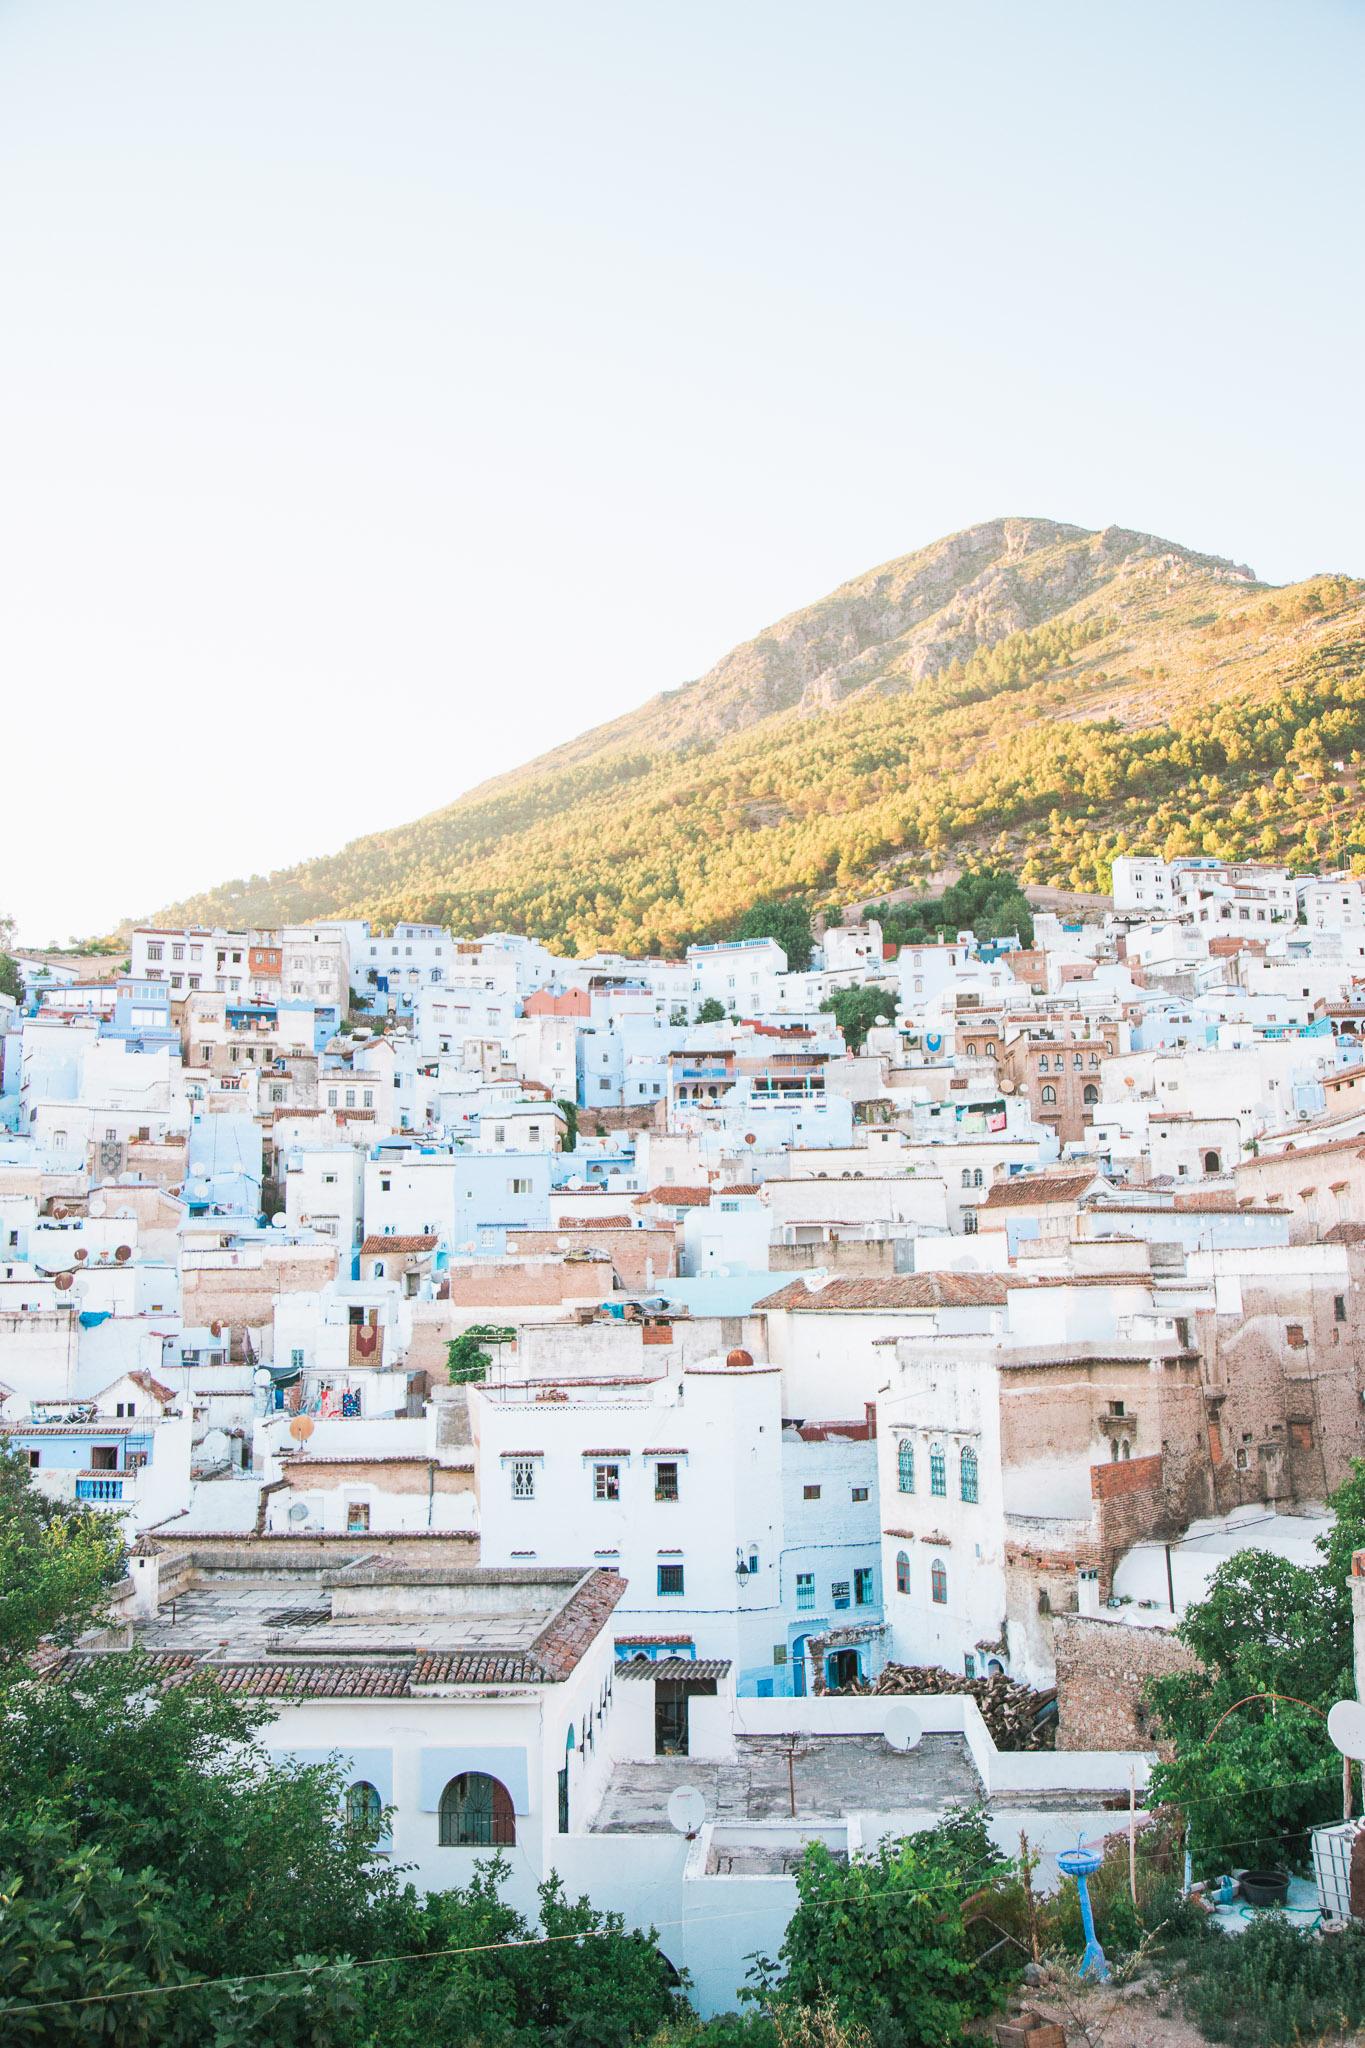 morocco-chefchaouen-blue-city-14.jpg